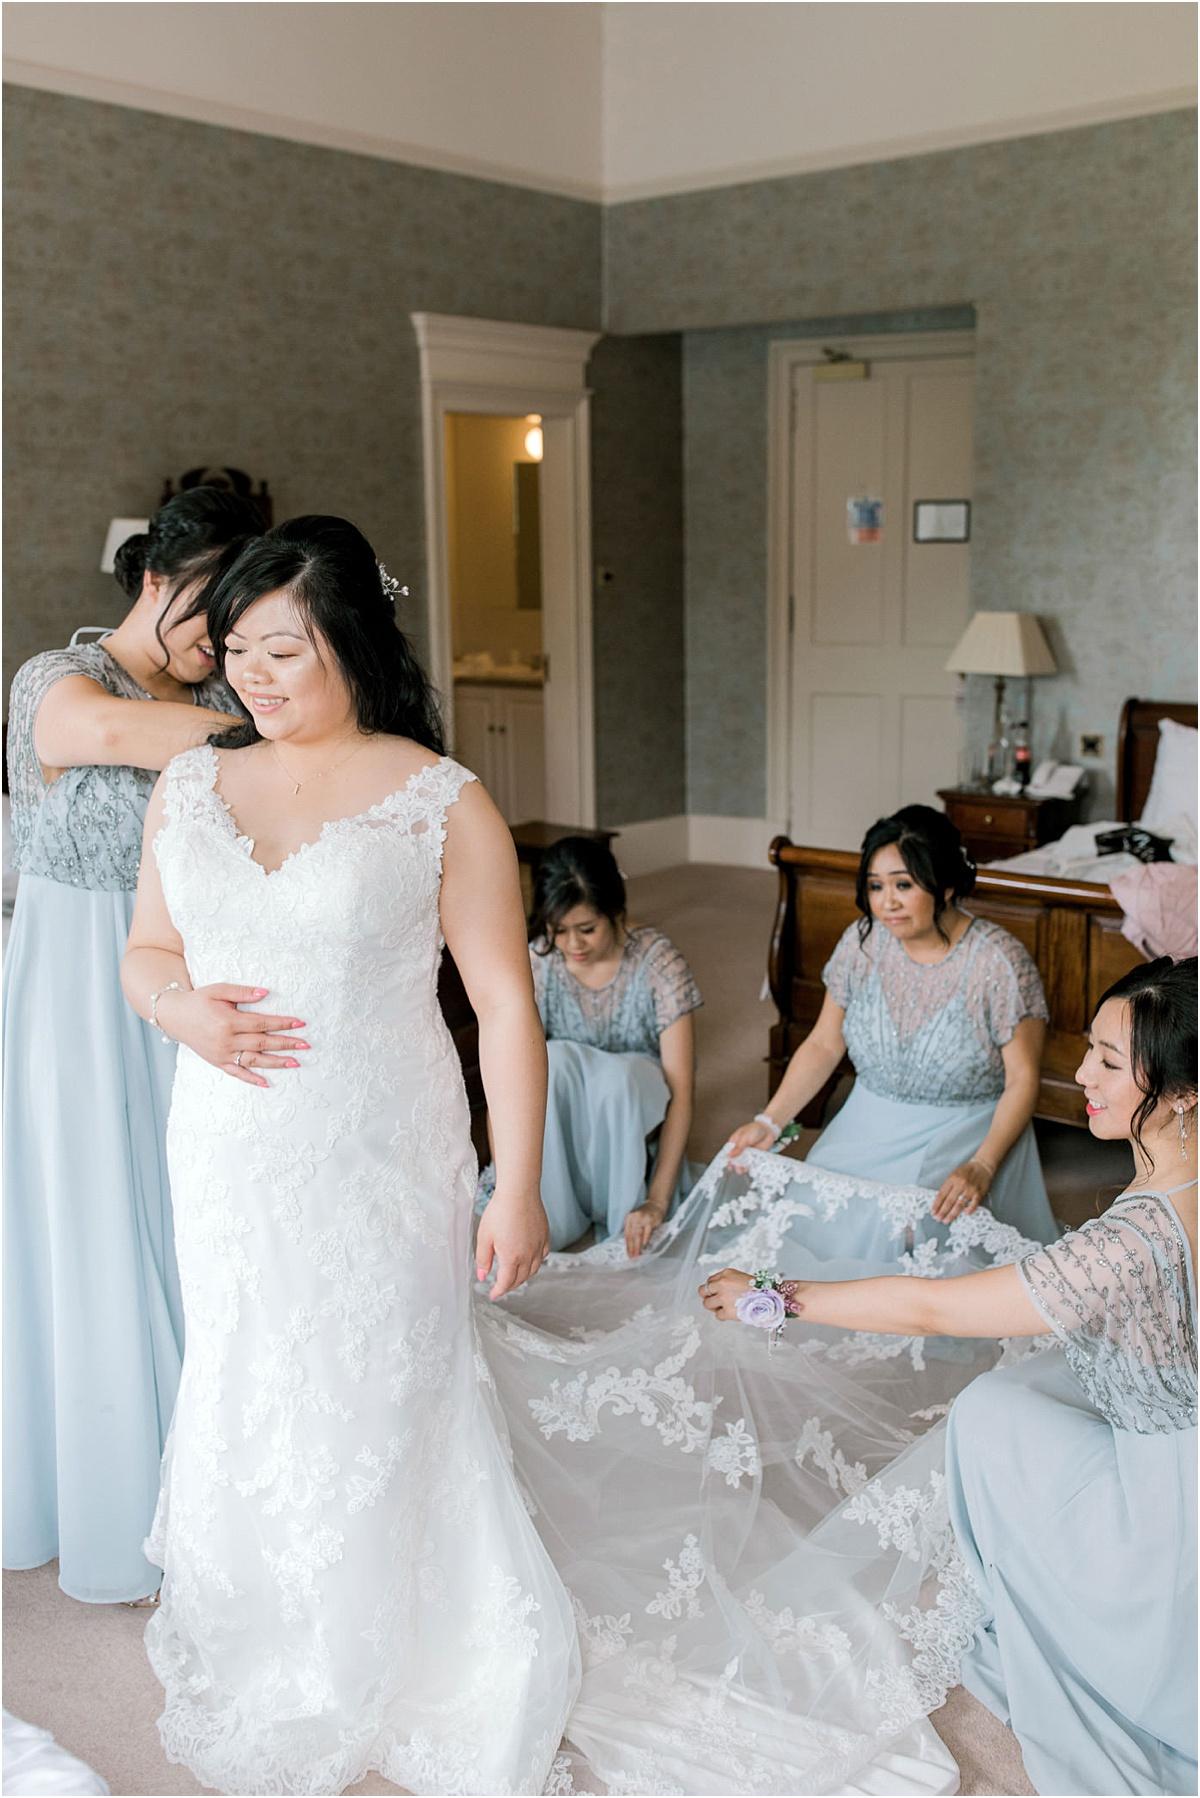 Cornhill Castle Wedding 0020.jpg